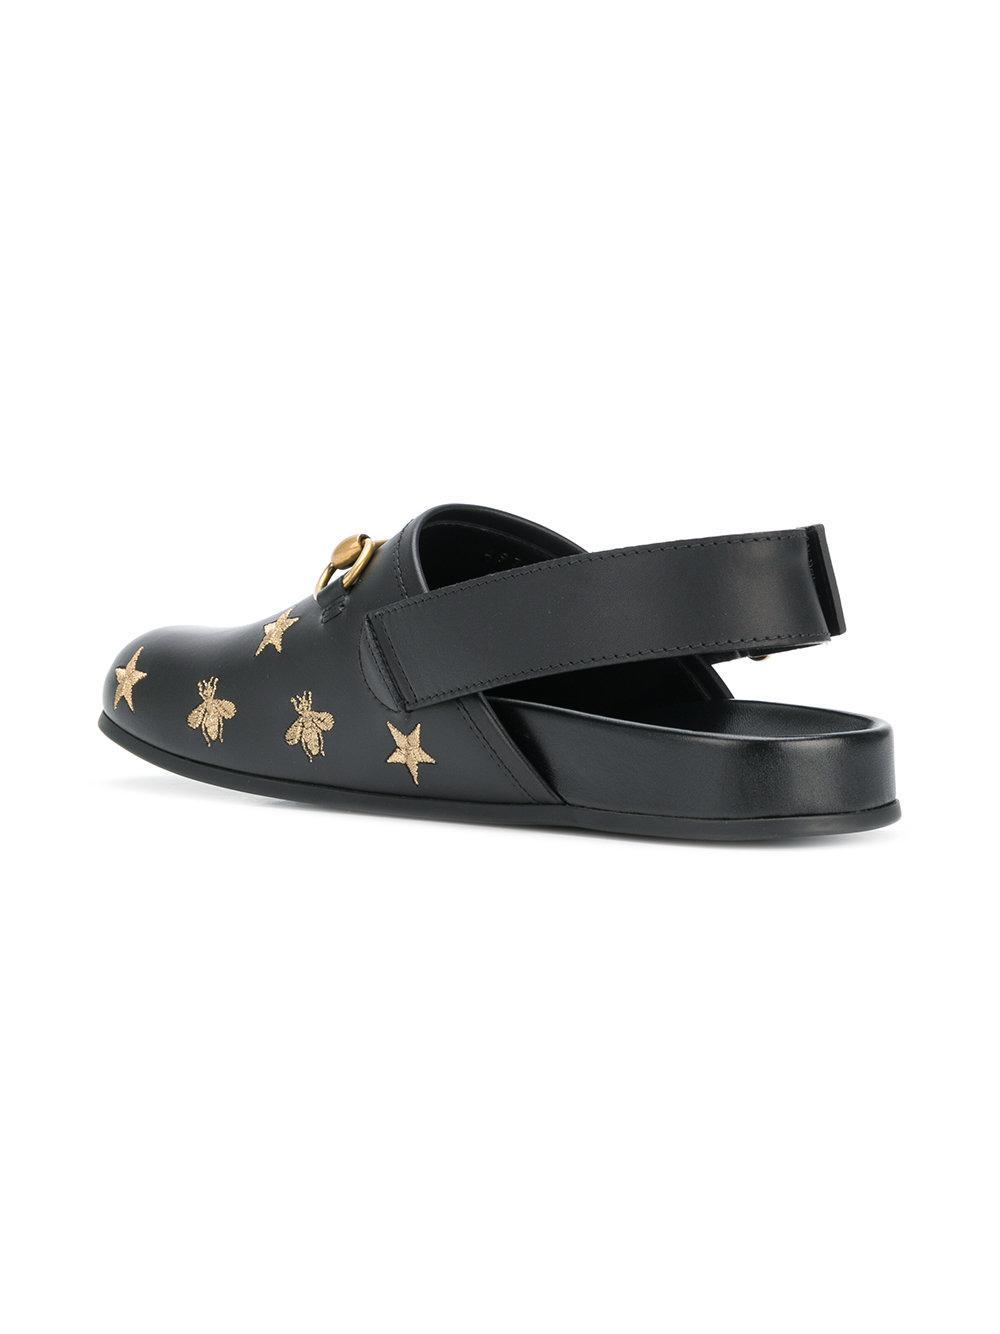 GucciHorsebit embroidered sandals HhNUg